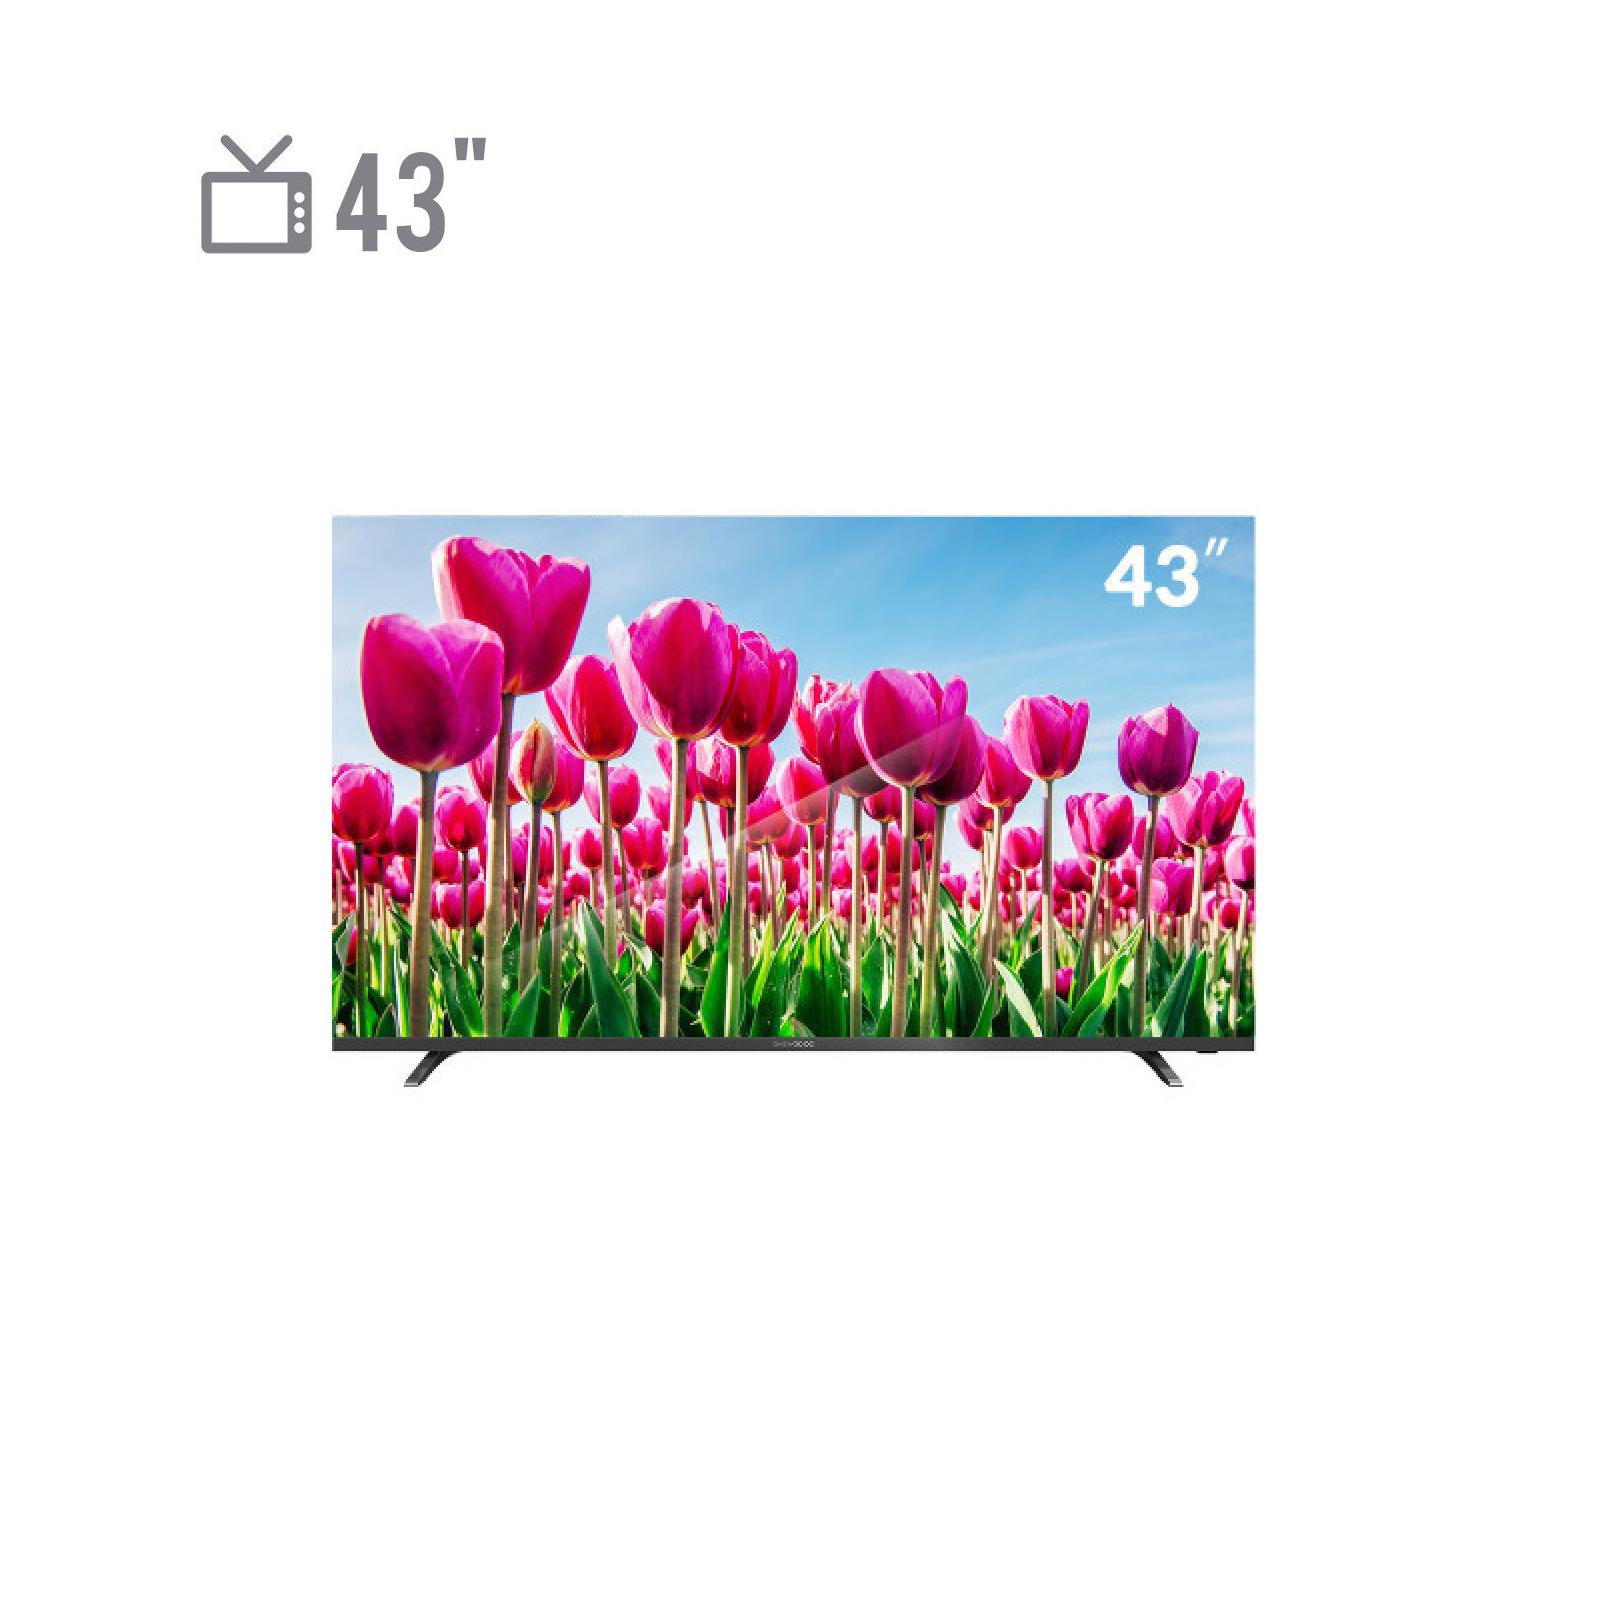 فروش نقدی و اقساطی تلویزیون ال ای دی دوو مدل DLE-43K4311 سایز 43 اینچ